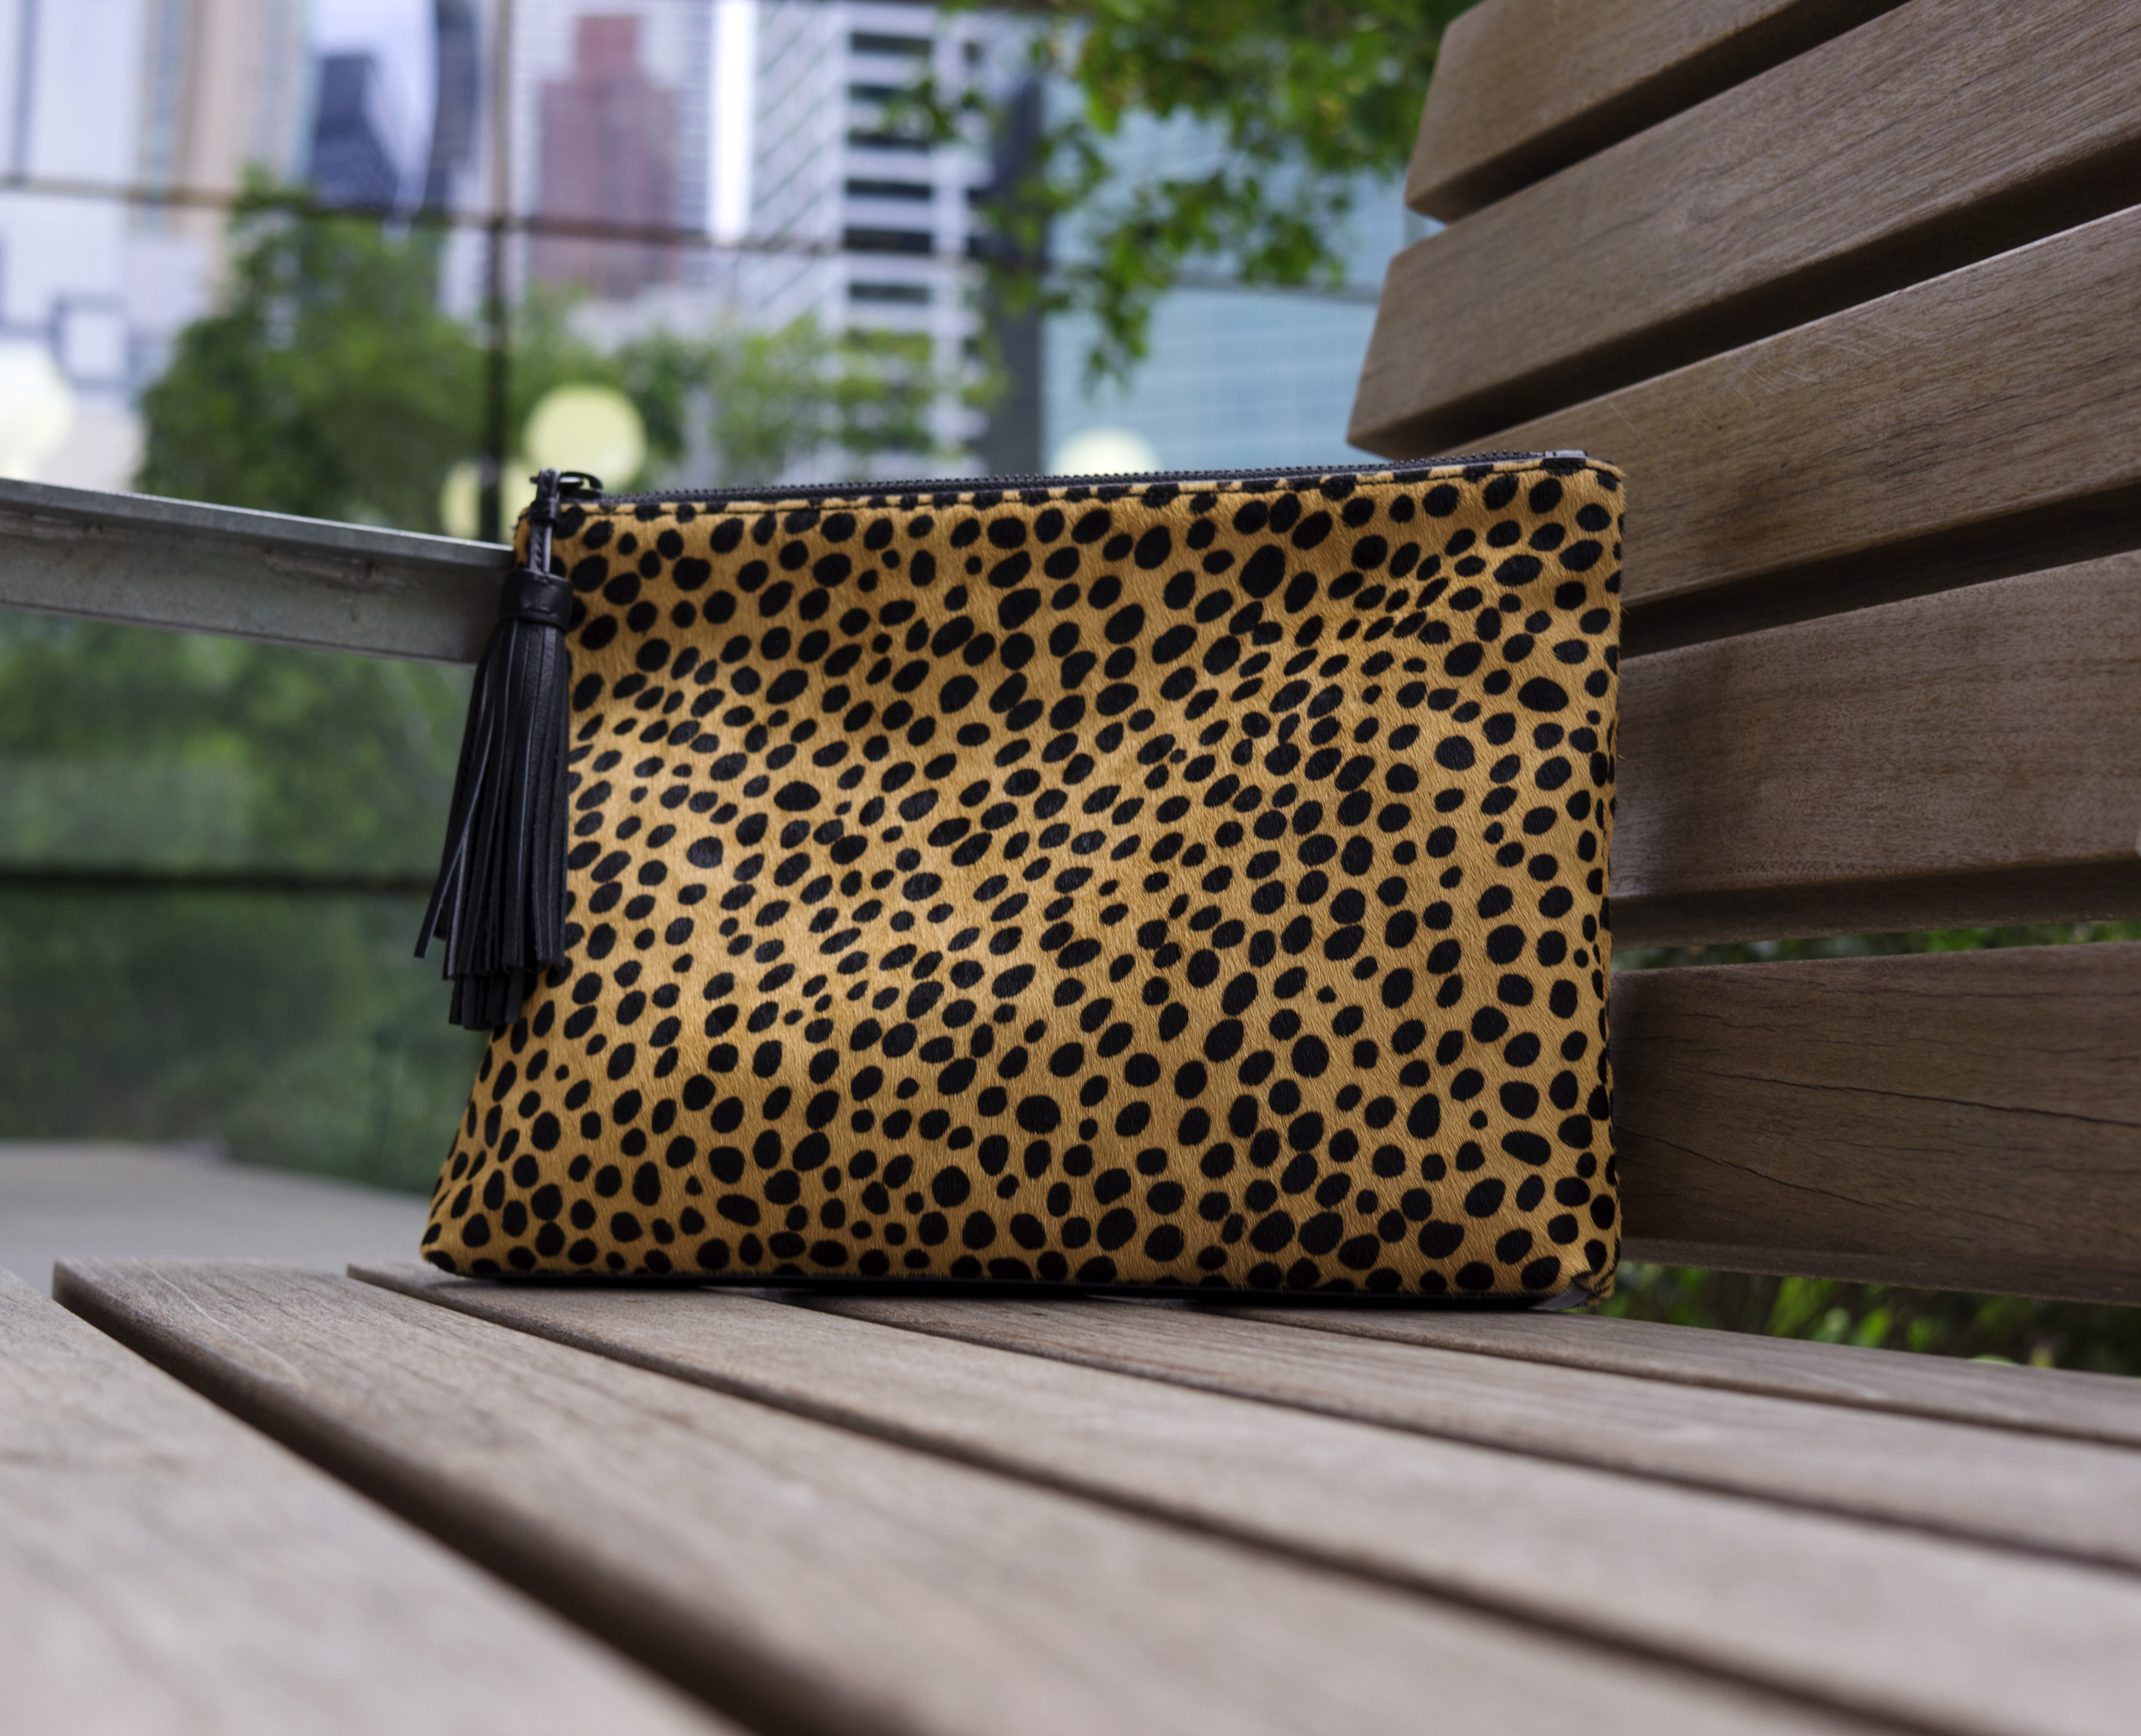 Bag Picks: Loeffler Randall Cheetah Clutch – BAG WATCH